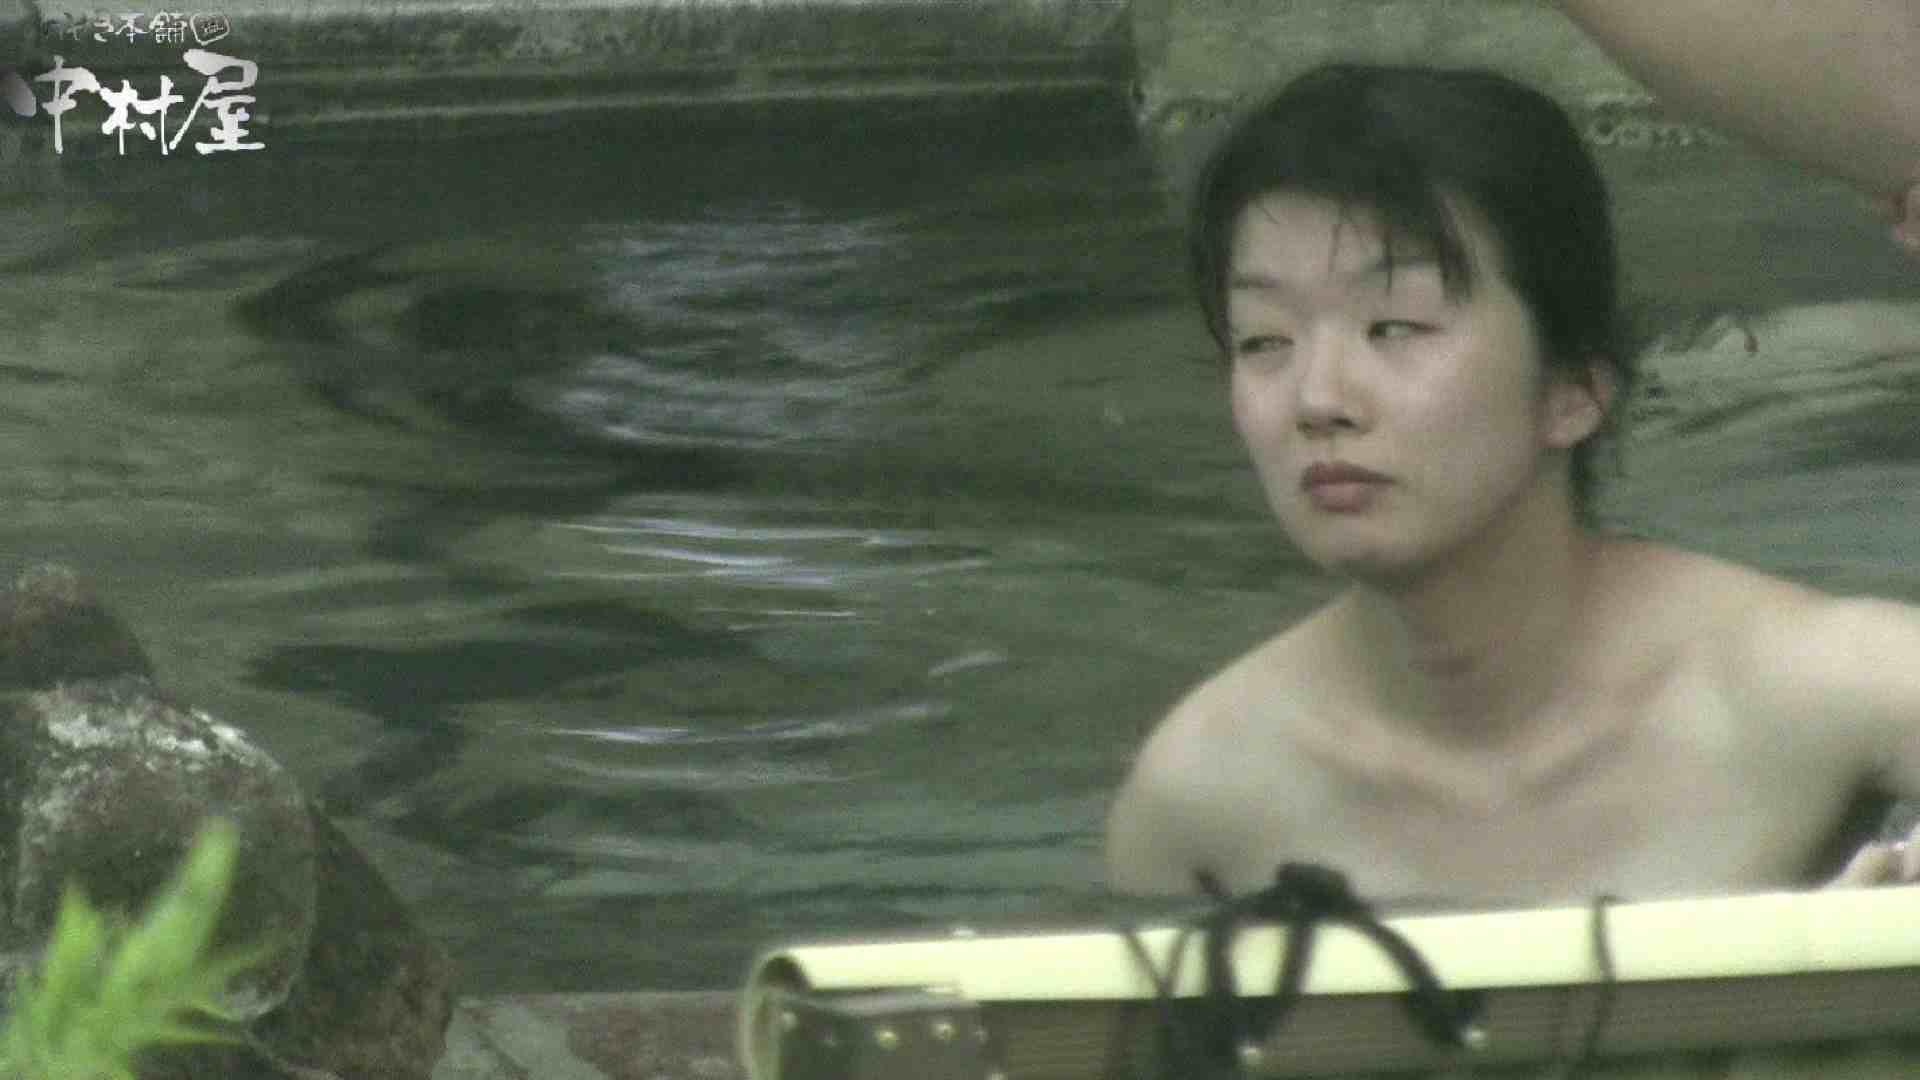 Aquaな露天風呂Vol.904 OL  60連発 36